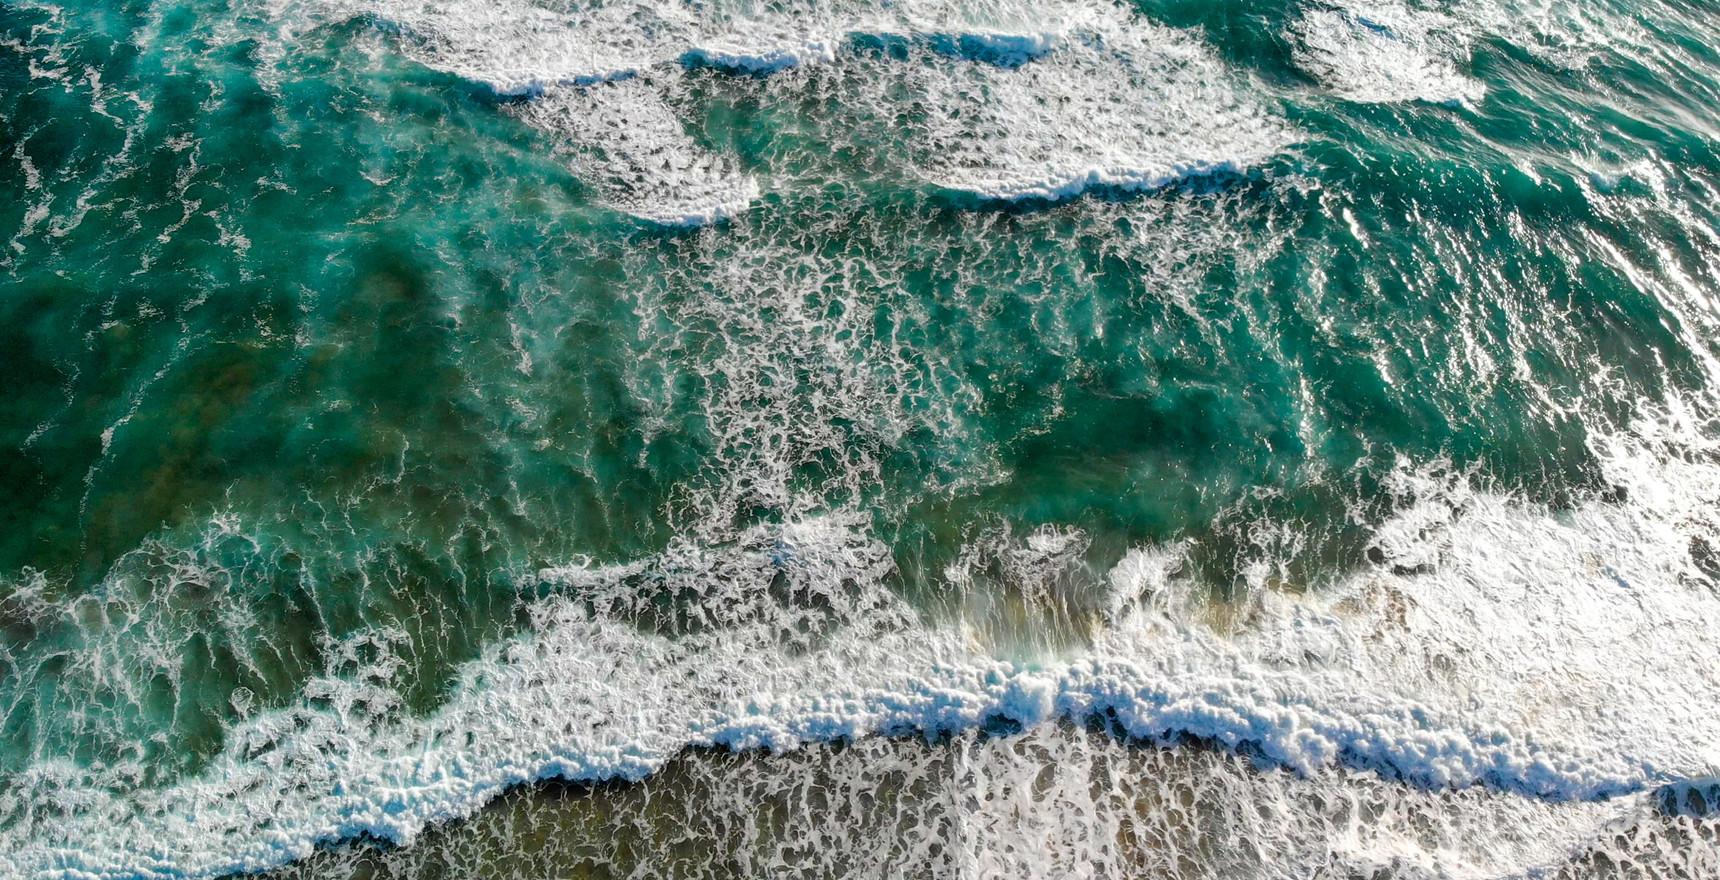 Overhead aerial view of ocean waves on the beach